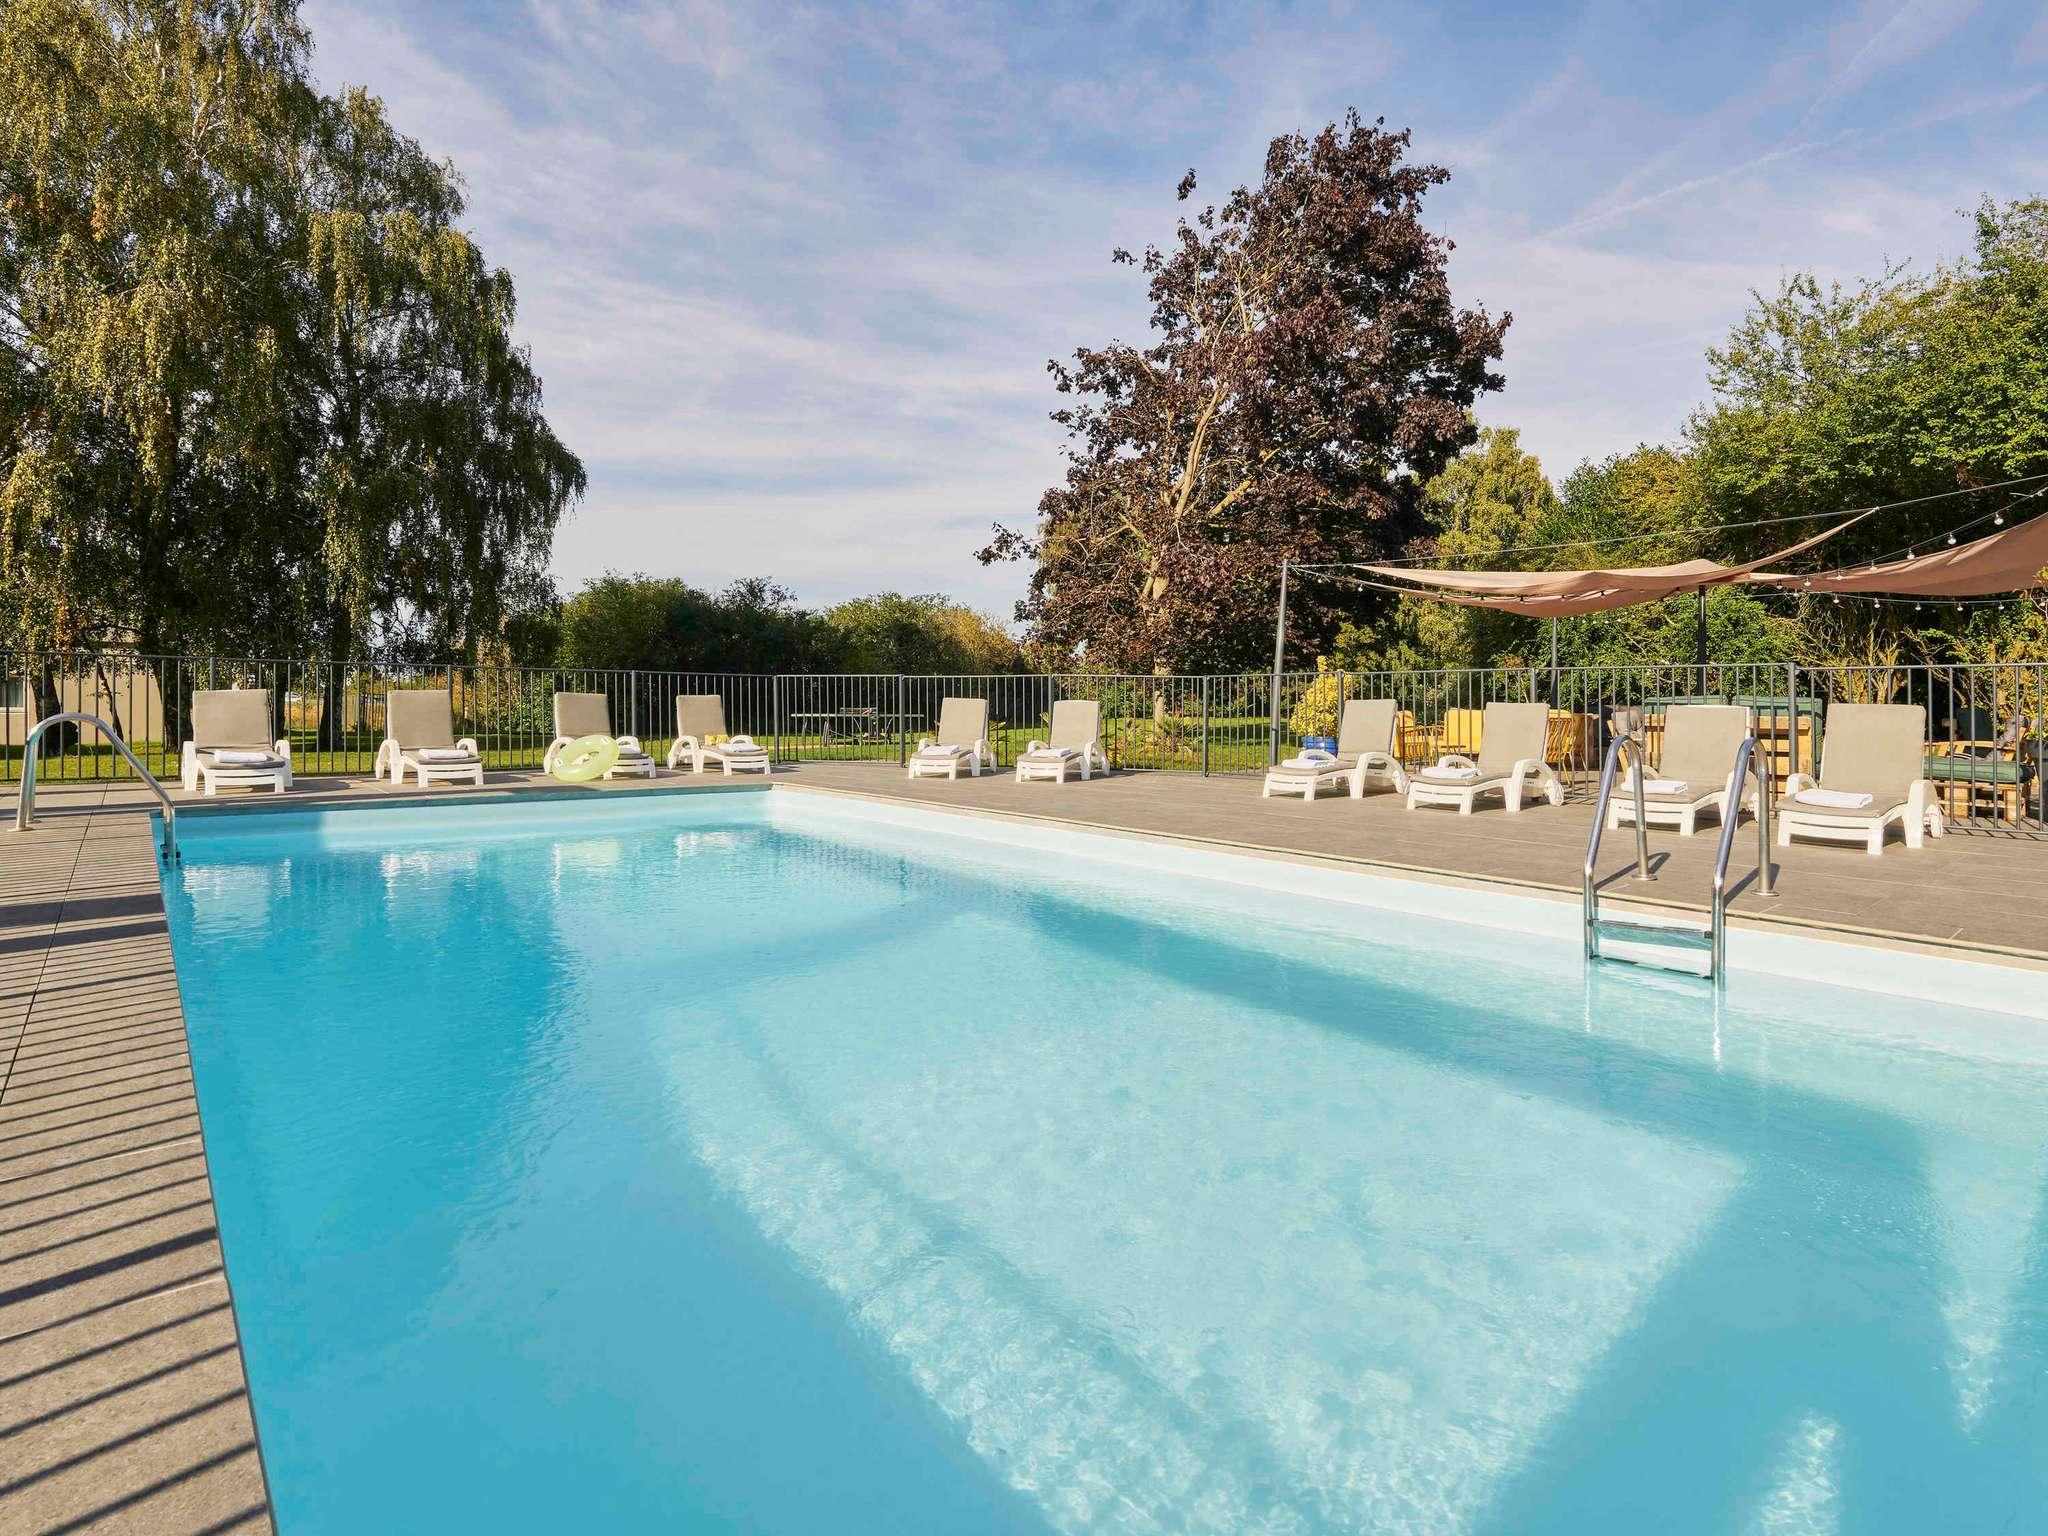 Hotel – Novotel Survilliers Saint-Witz